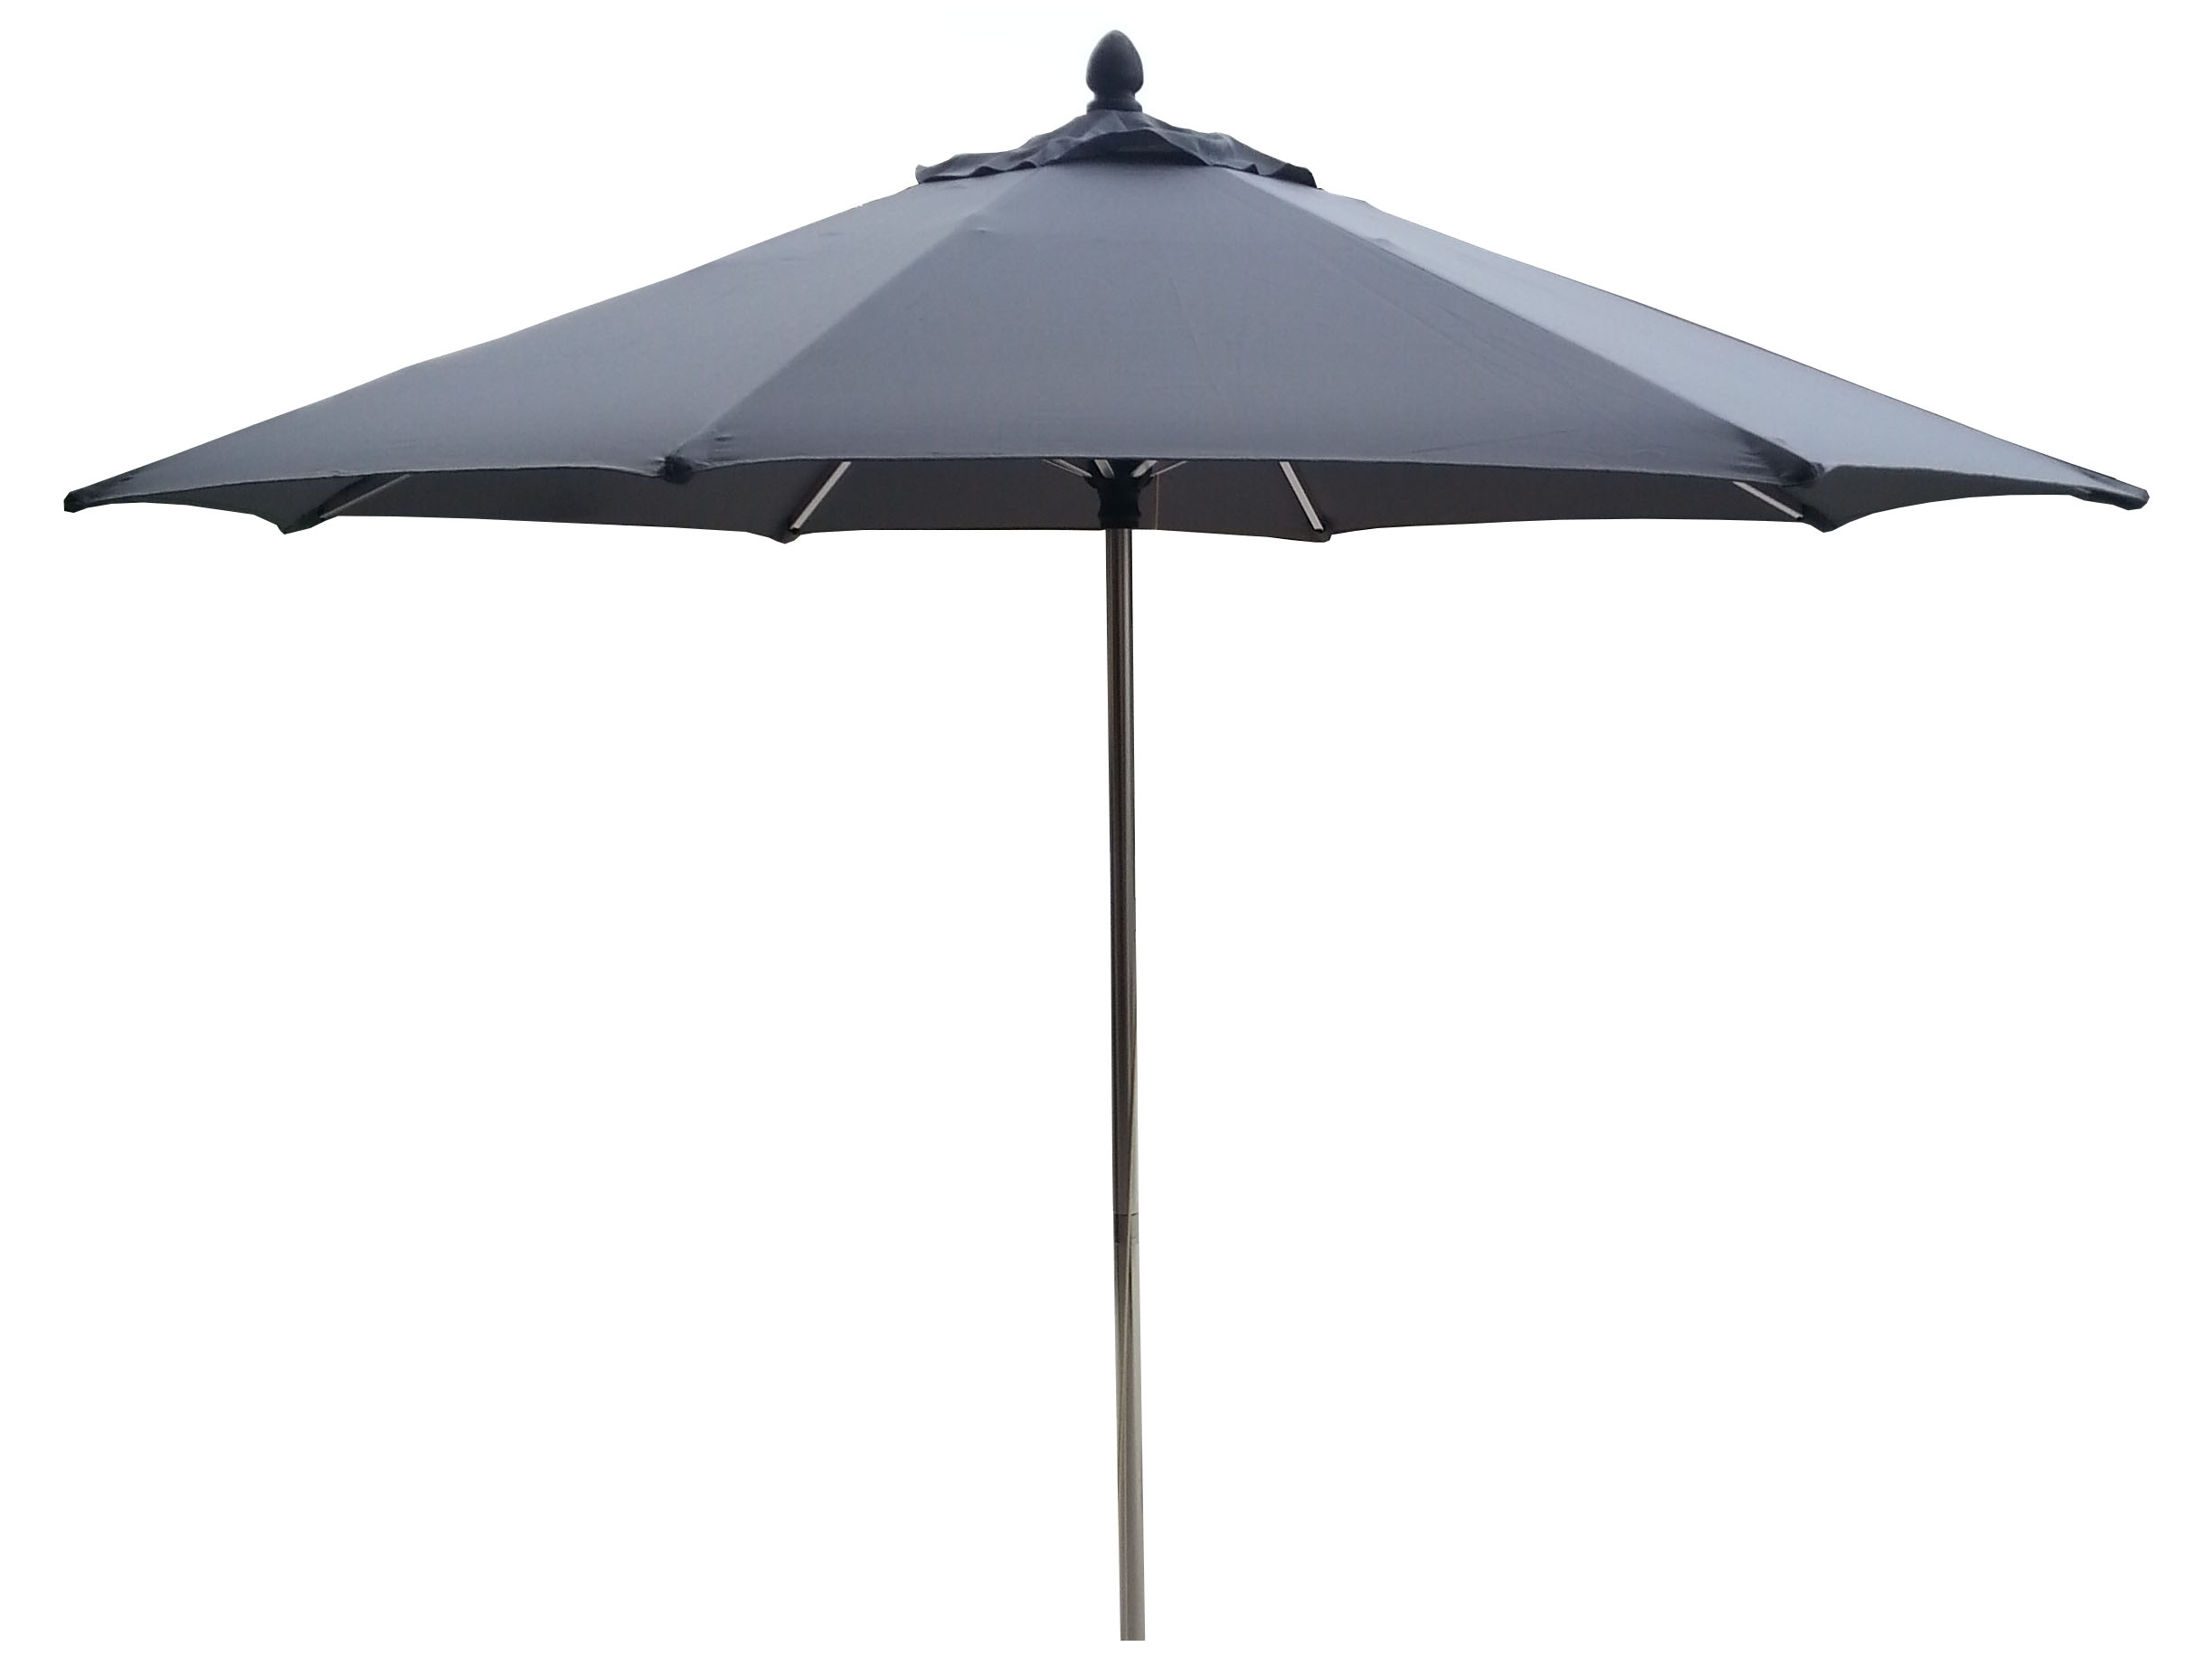 Market Umbrella Archives – Rainbrella With Current Grey Patio Umbrellas (View 15 of 20)